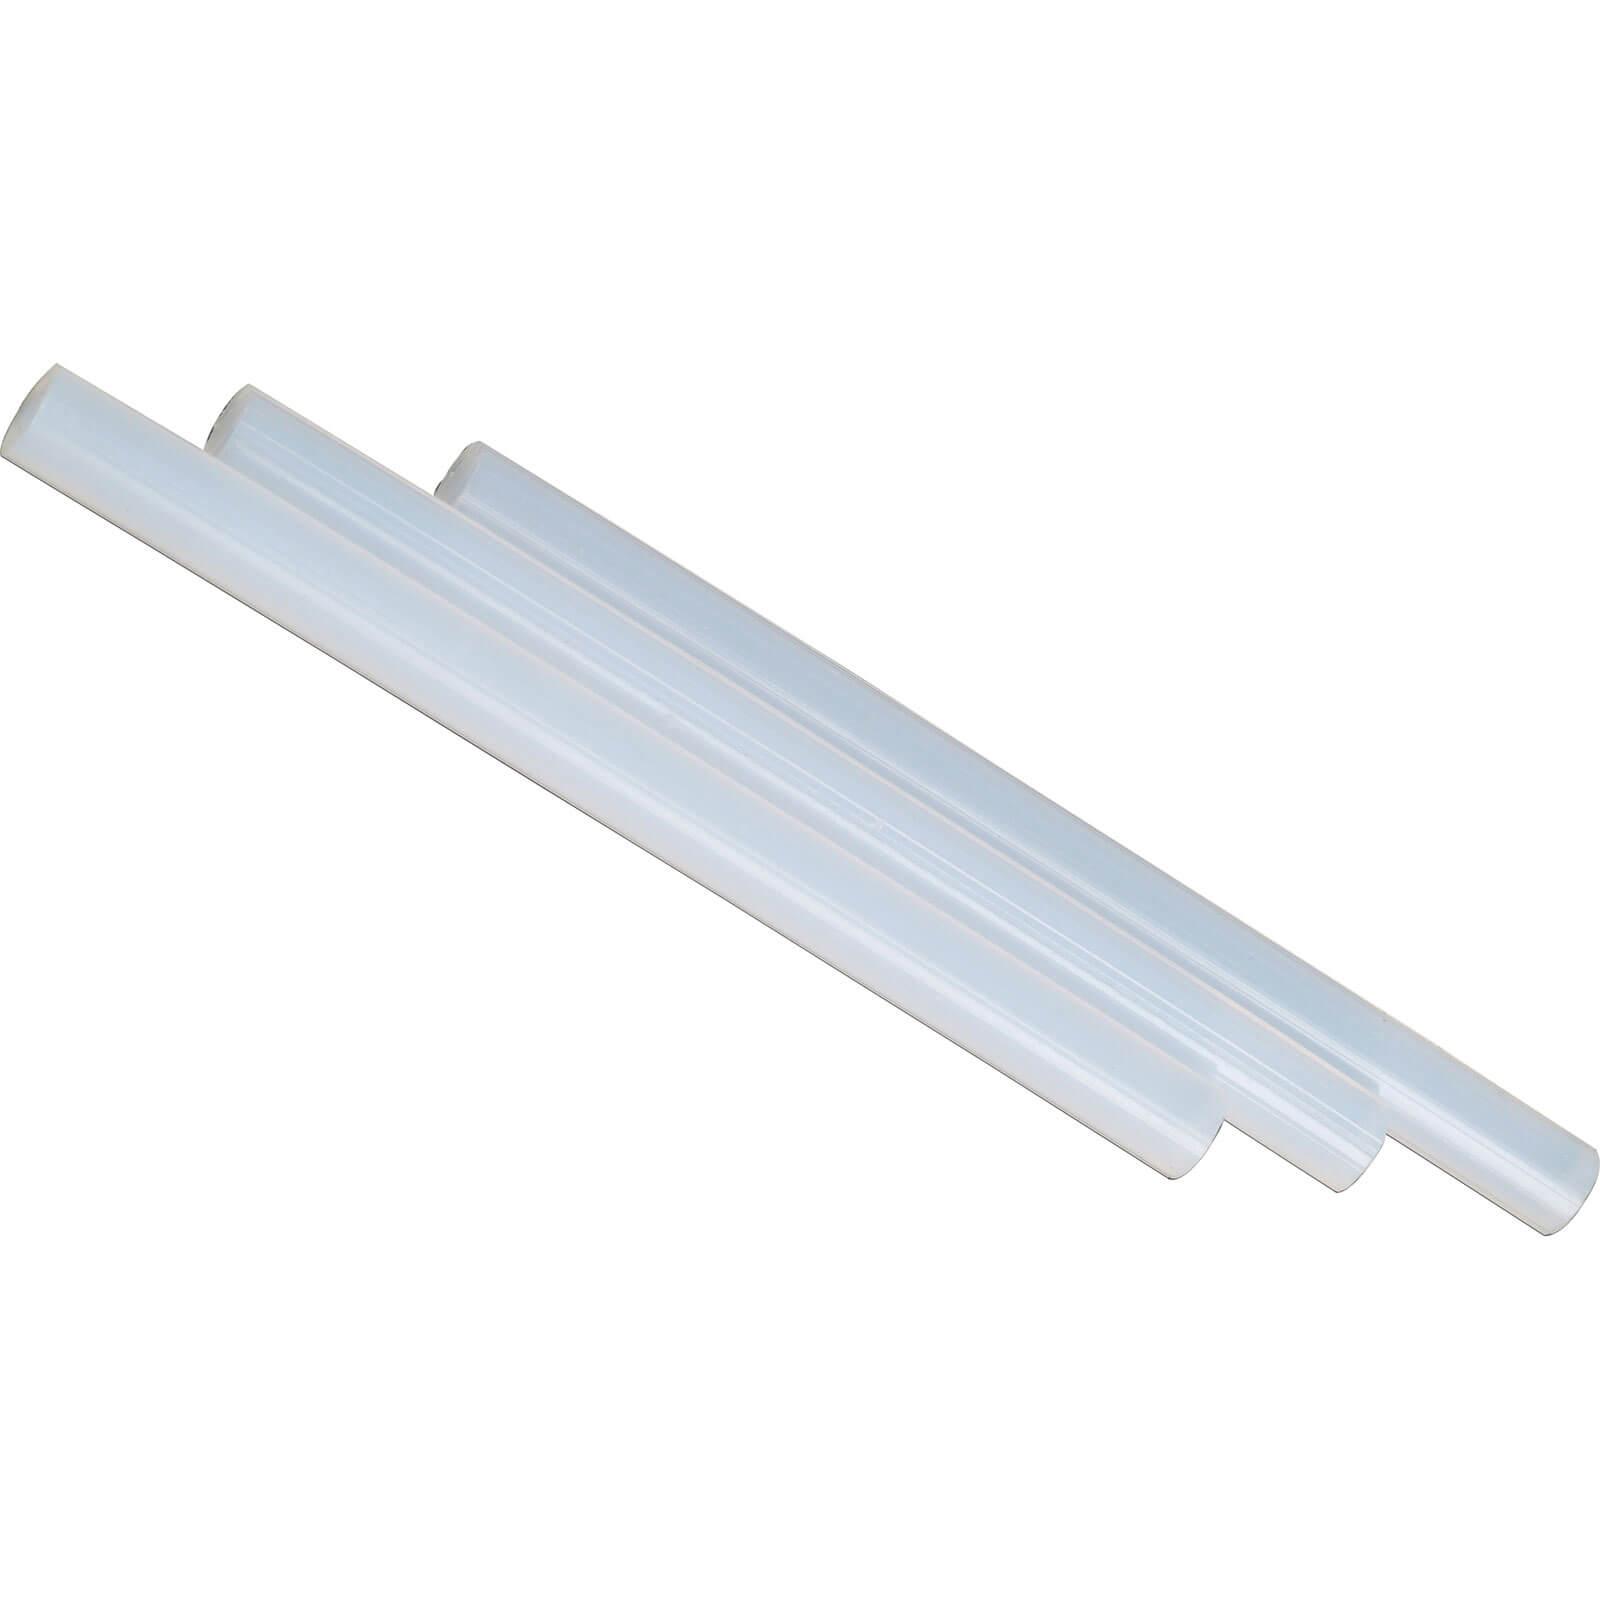 Bostik 6330 Glue Sticks 11 x 300mm 5kg